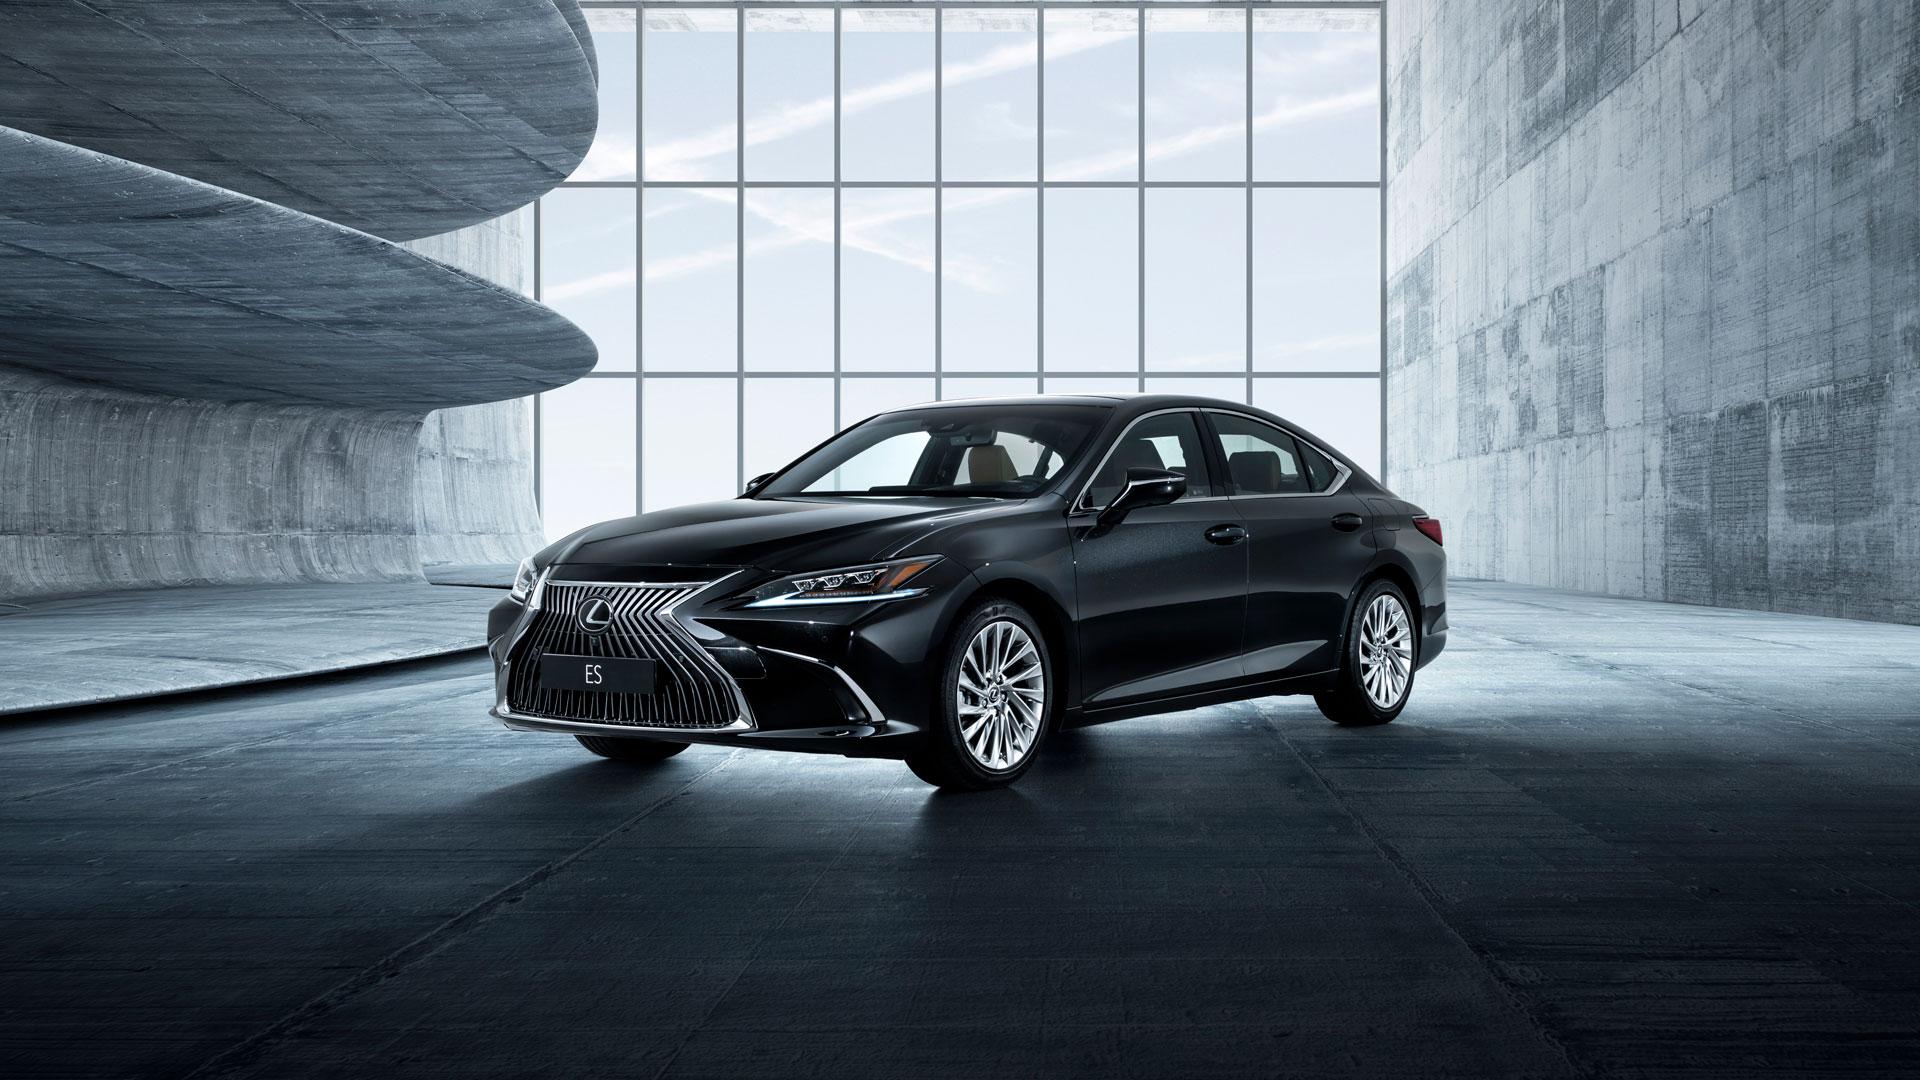 Nuevo Lexus ES 300h hero asset